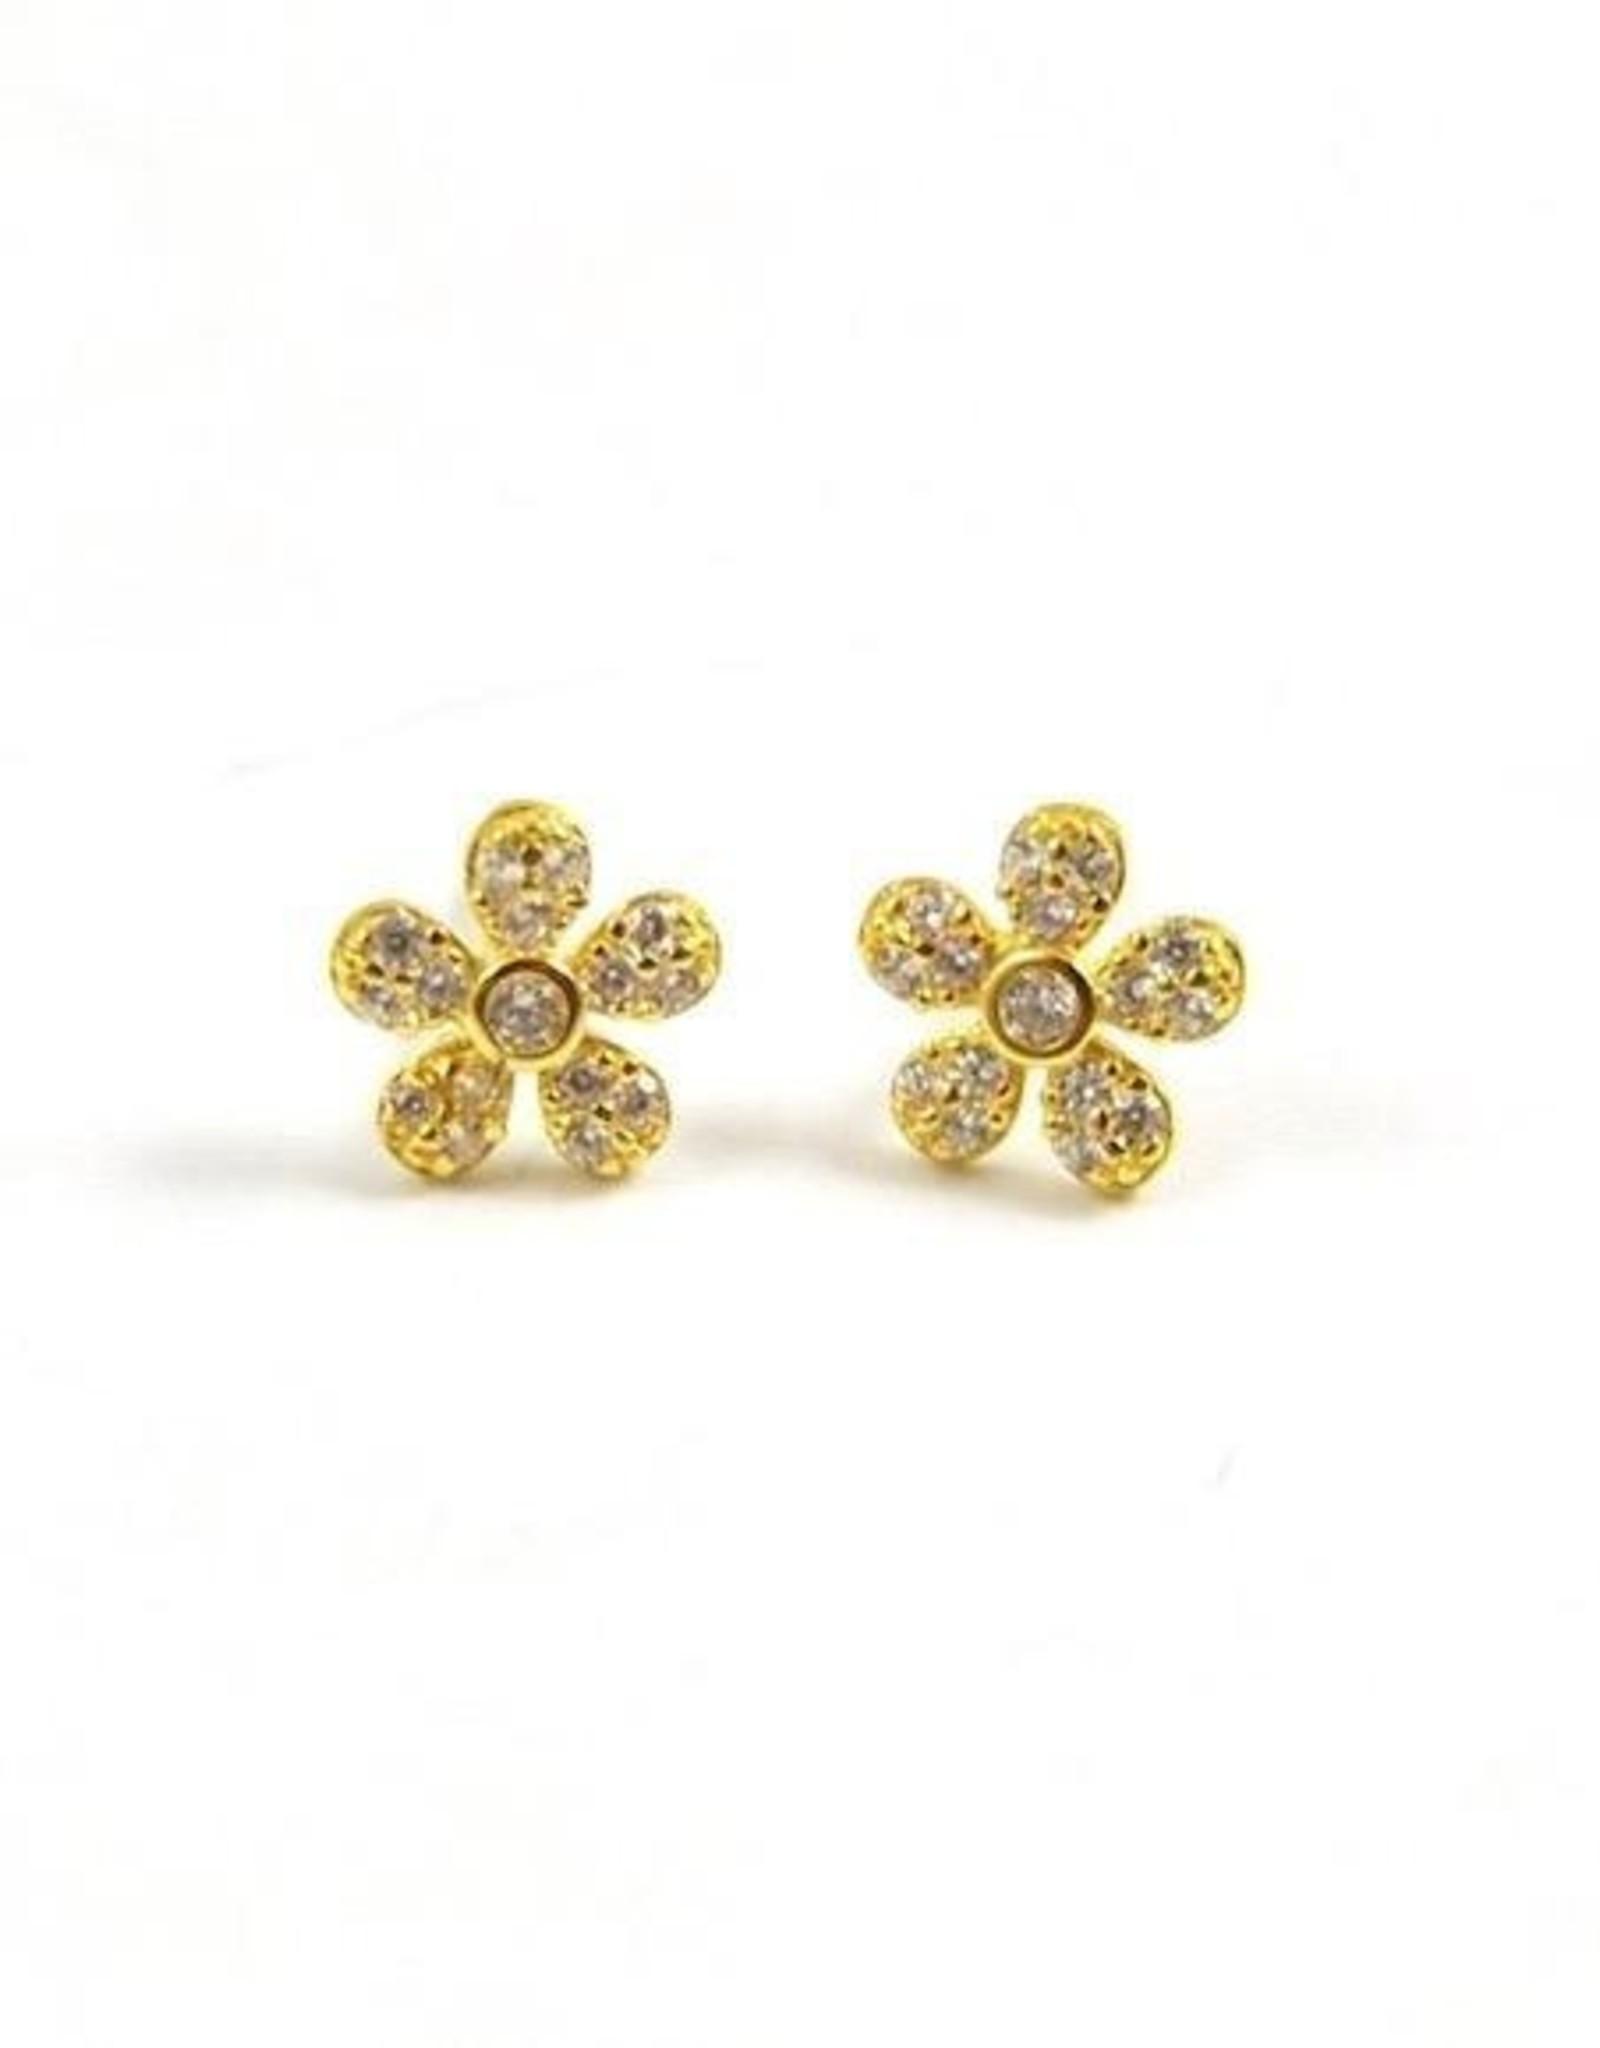 f.y.b. f.y.b. - Earrings Flower Studs Gold